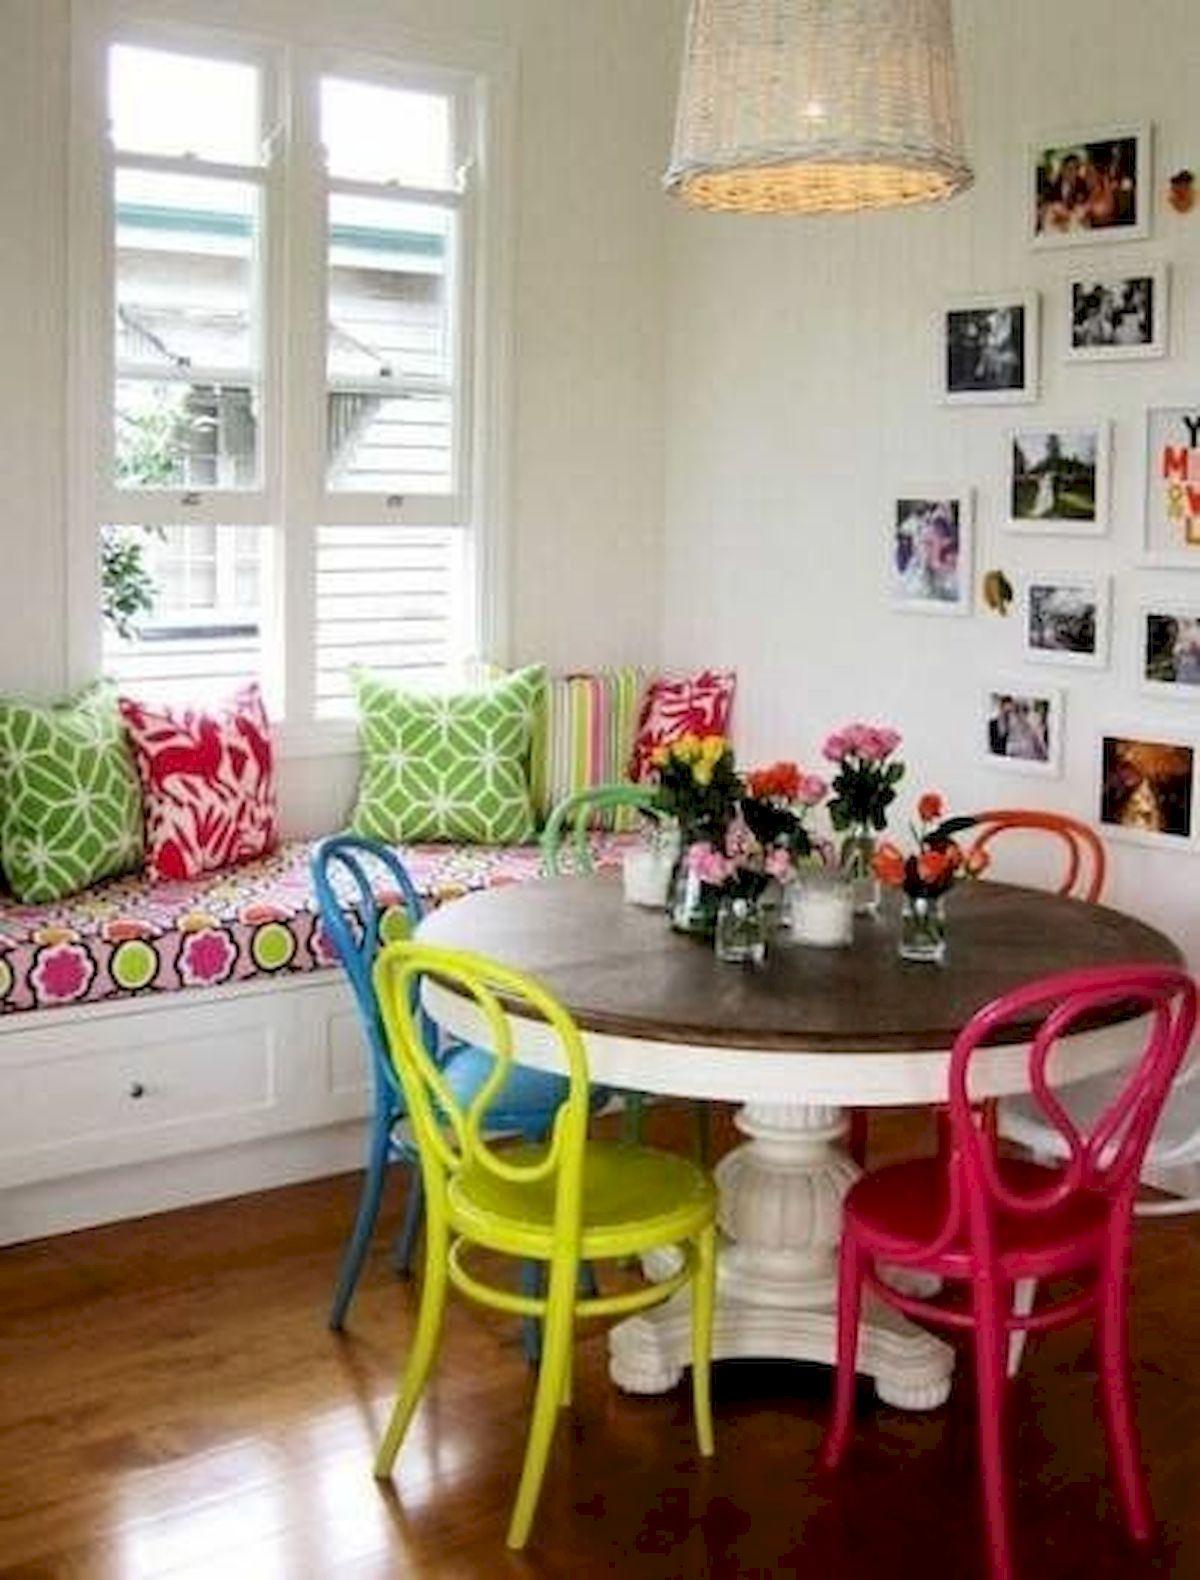 45 Colorful Interior Home Design and Decor Ideas (11)